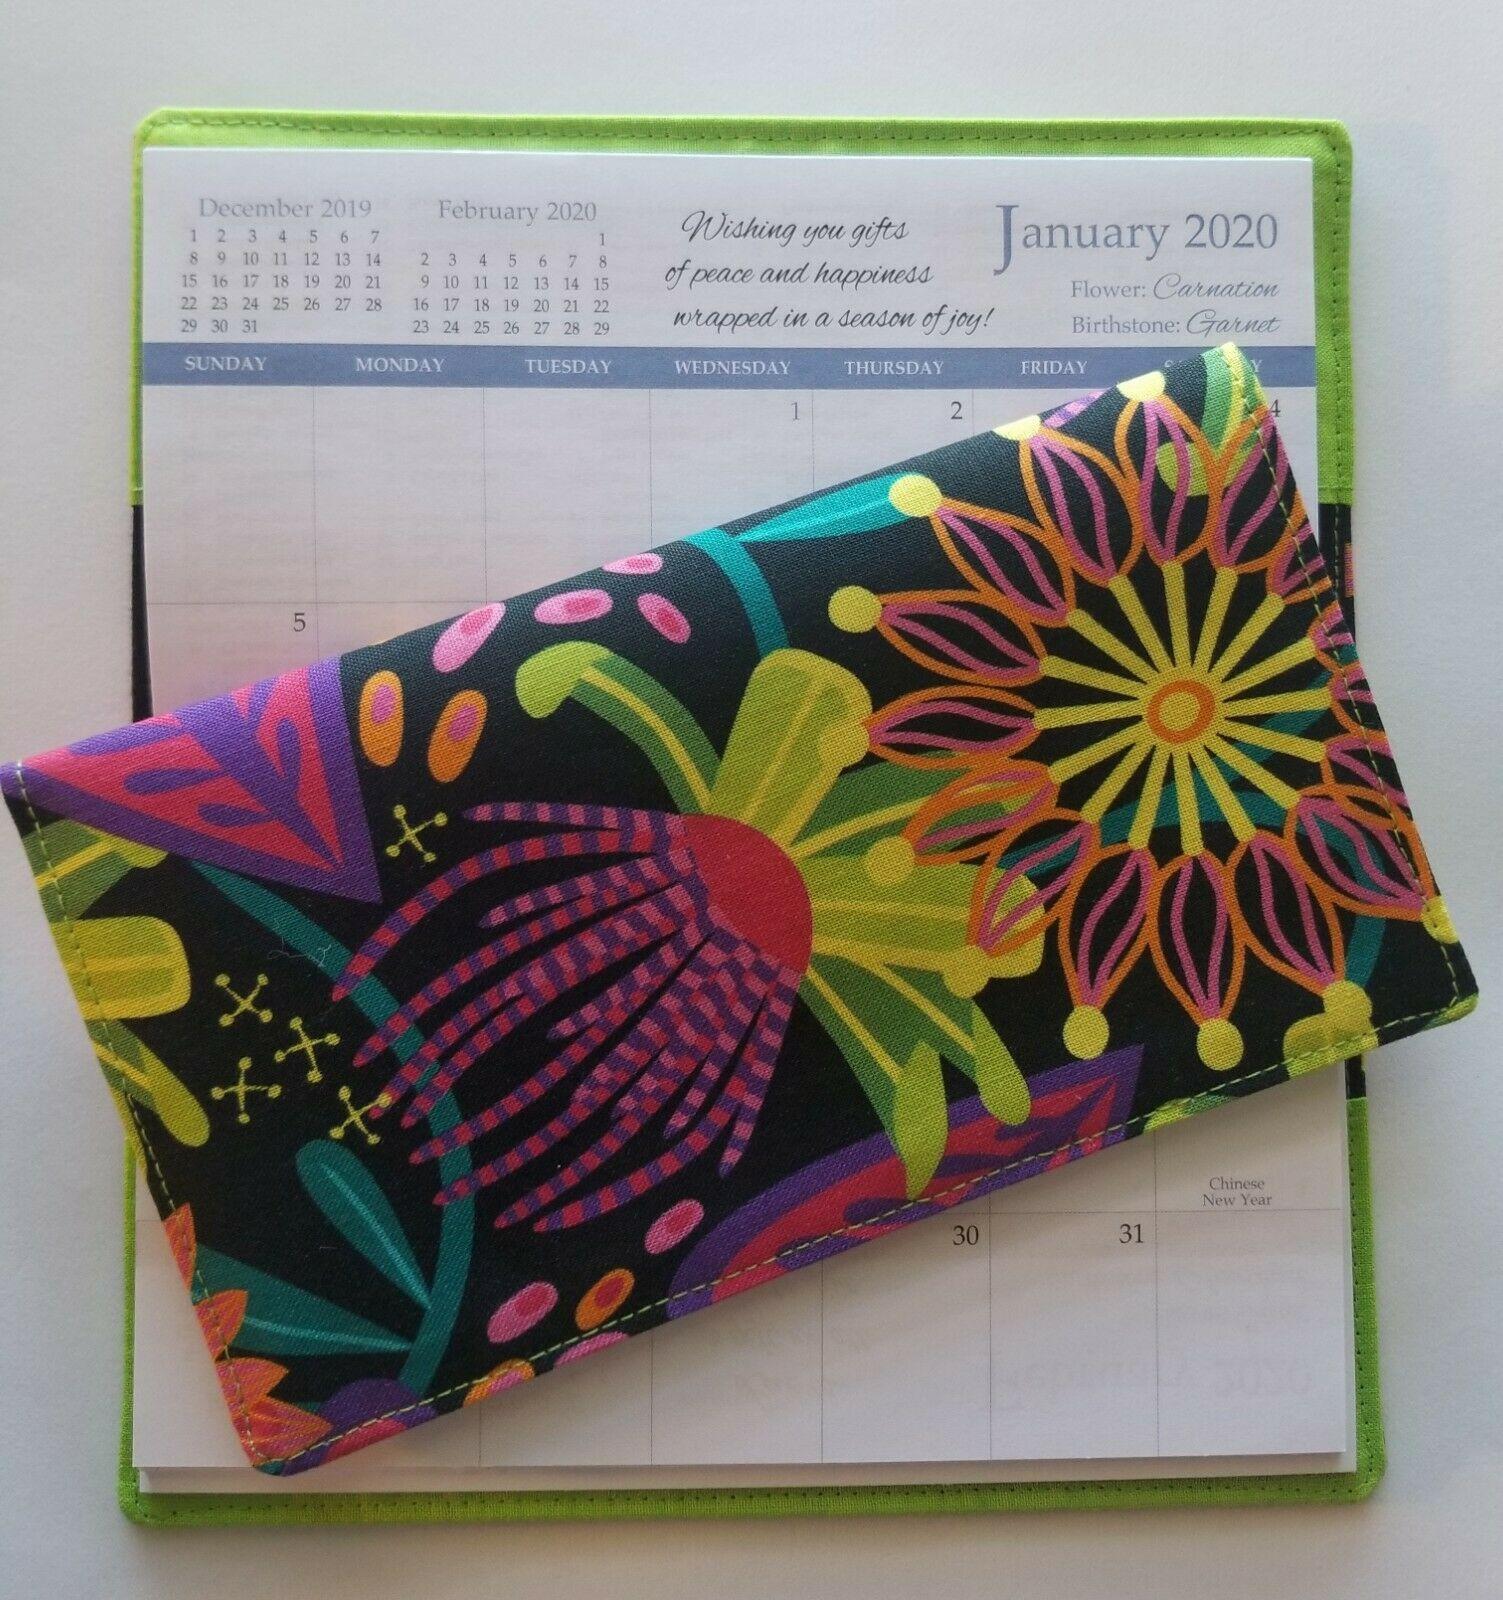 Cotton Fabric Black Floral Multi 202021 Pocket Calendar